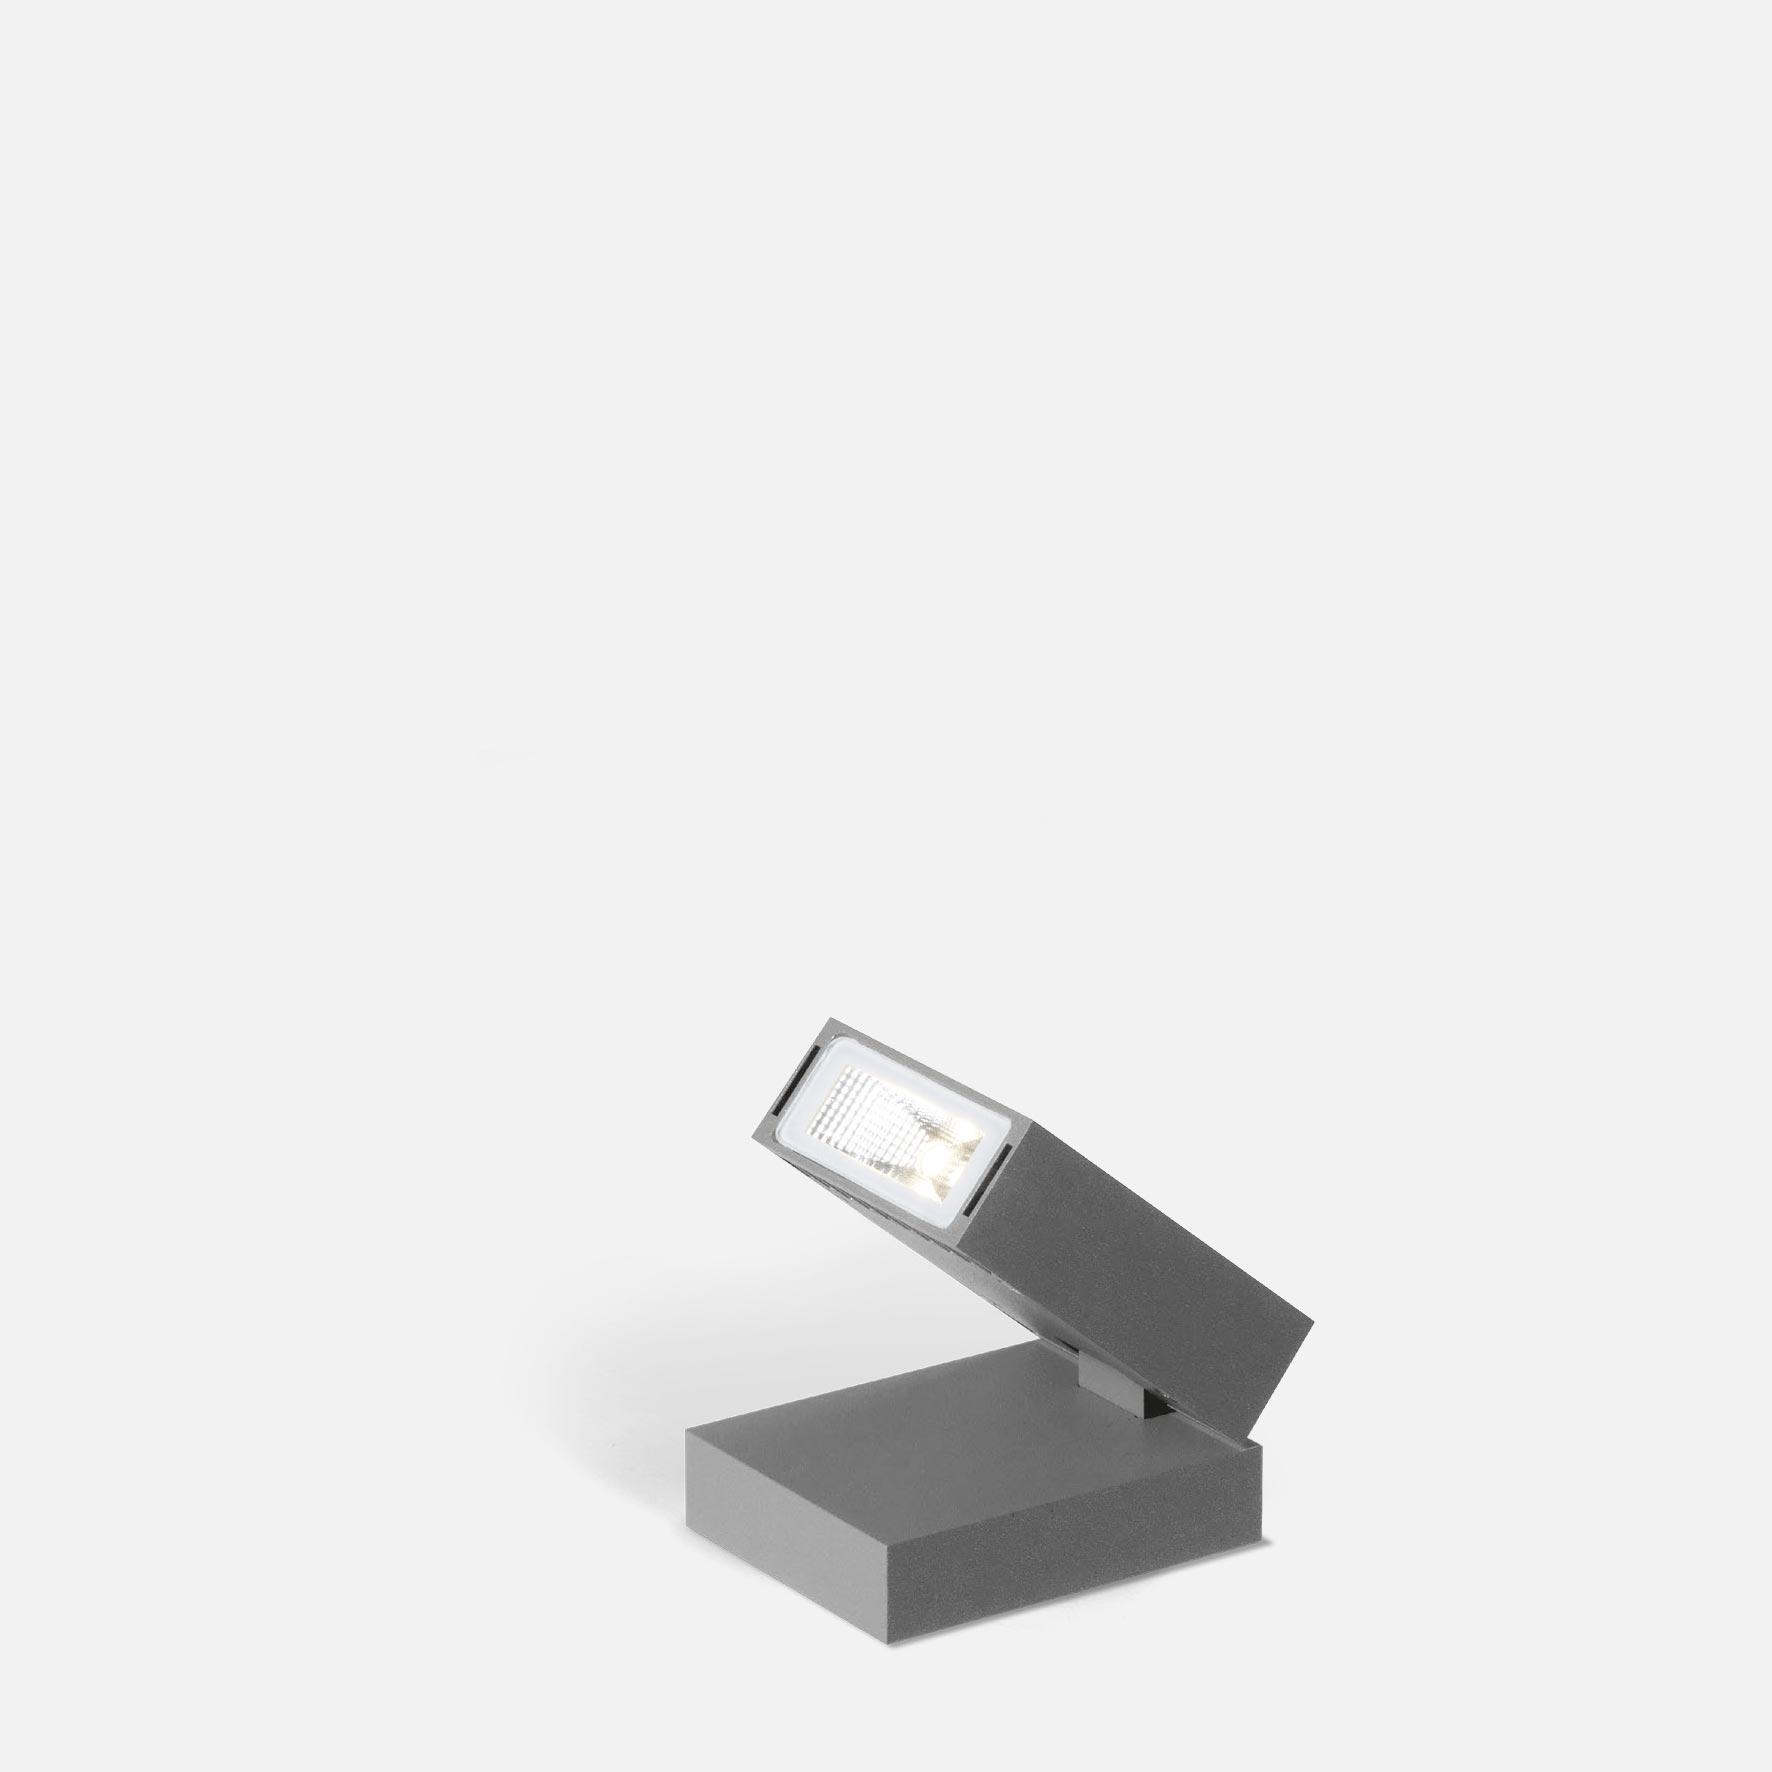 Stake fold 1.0 dark grey texture